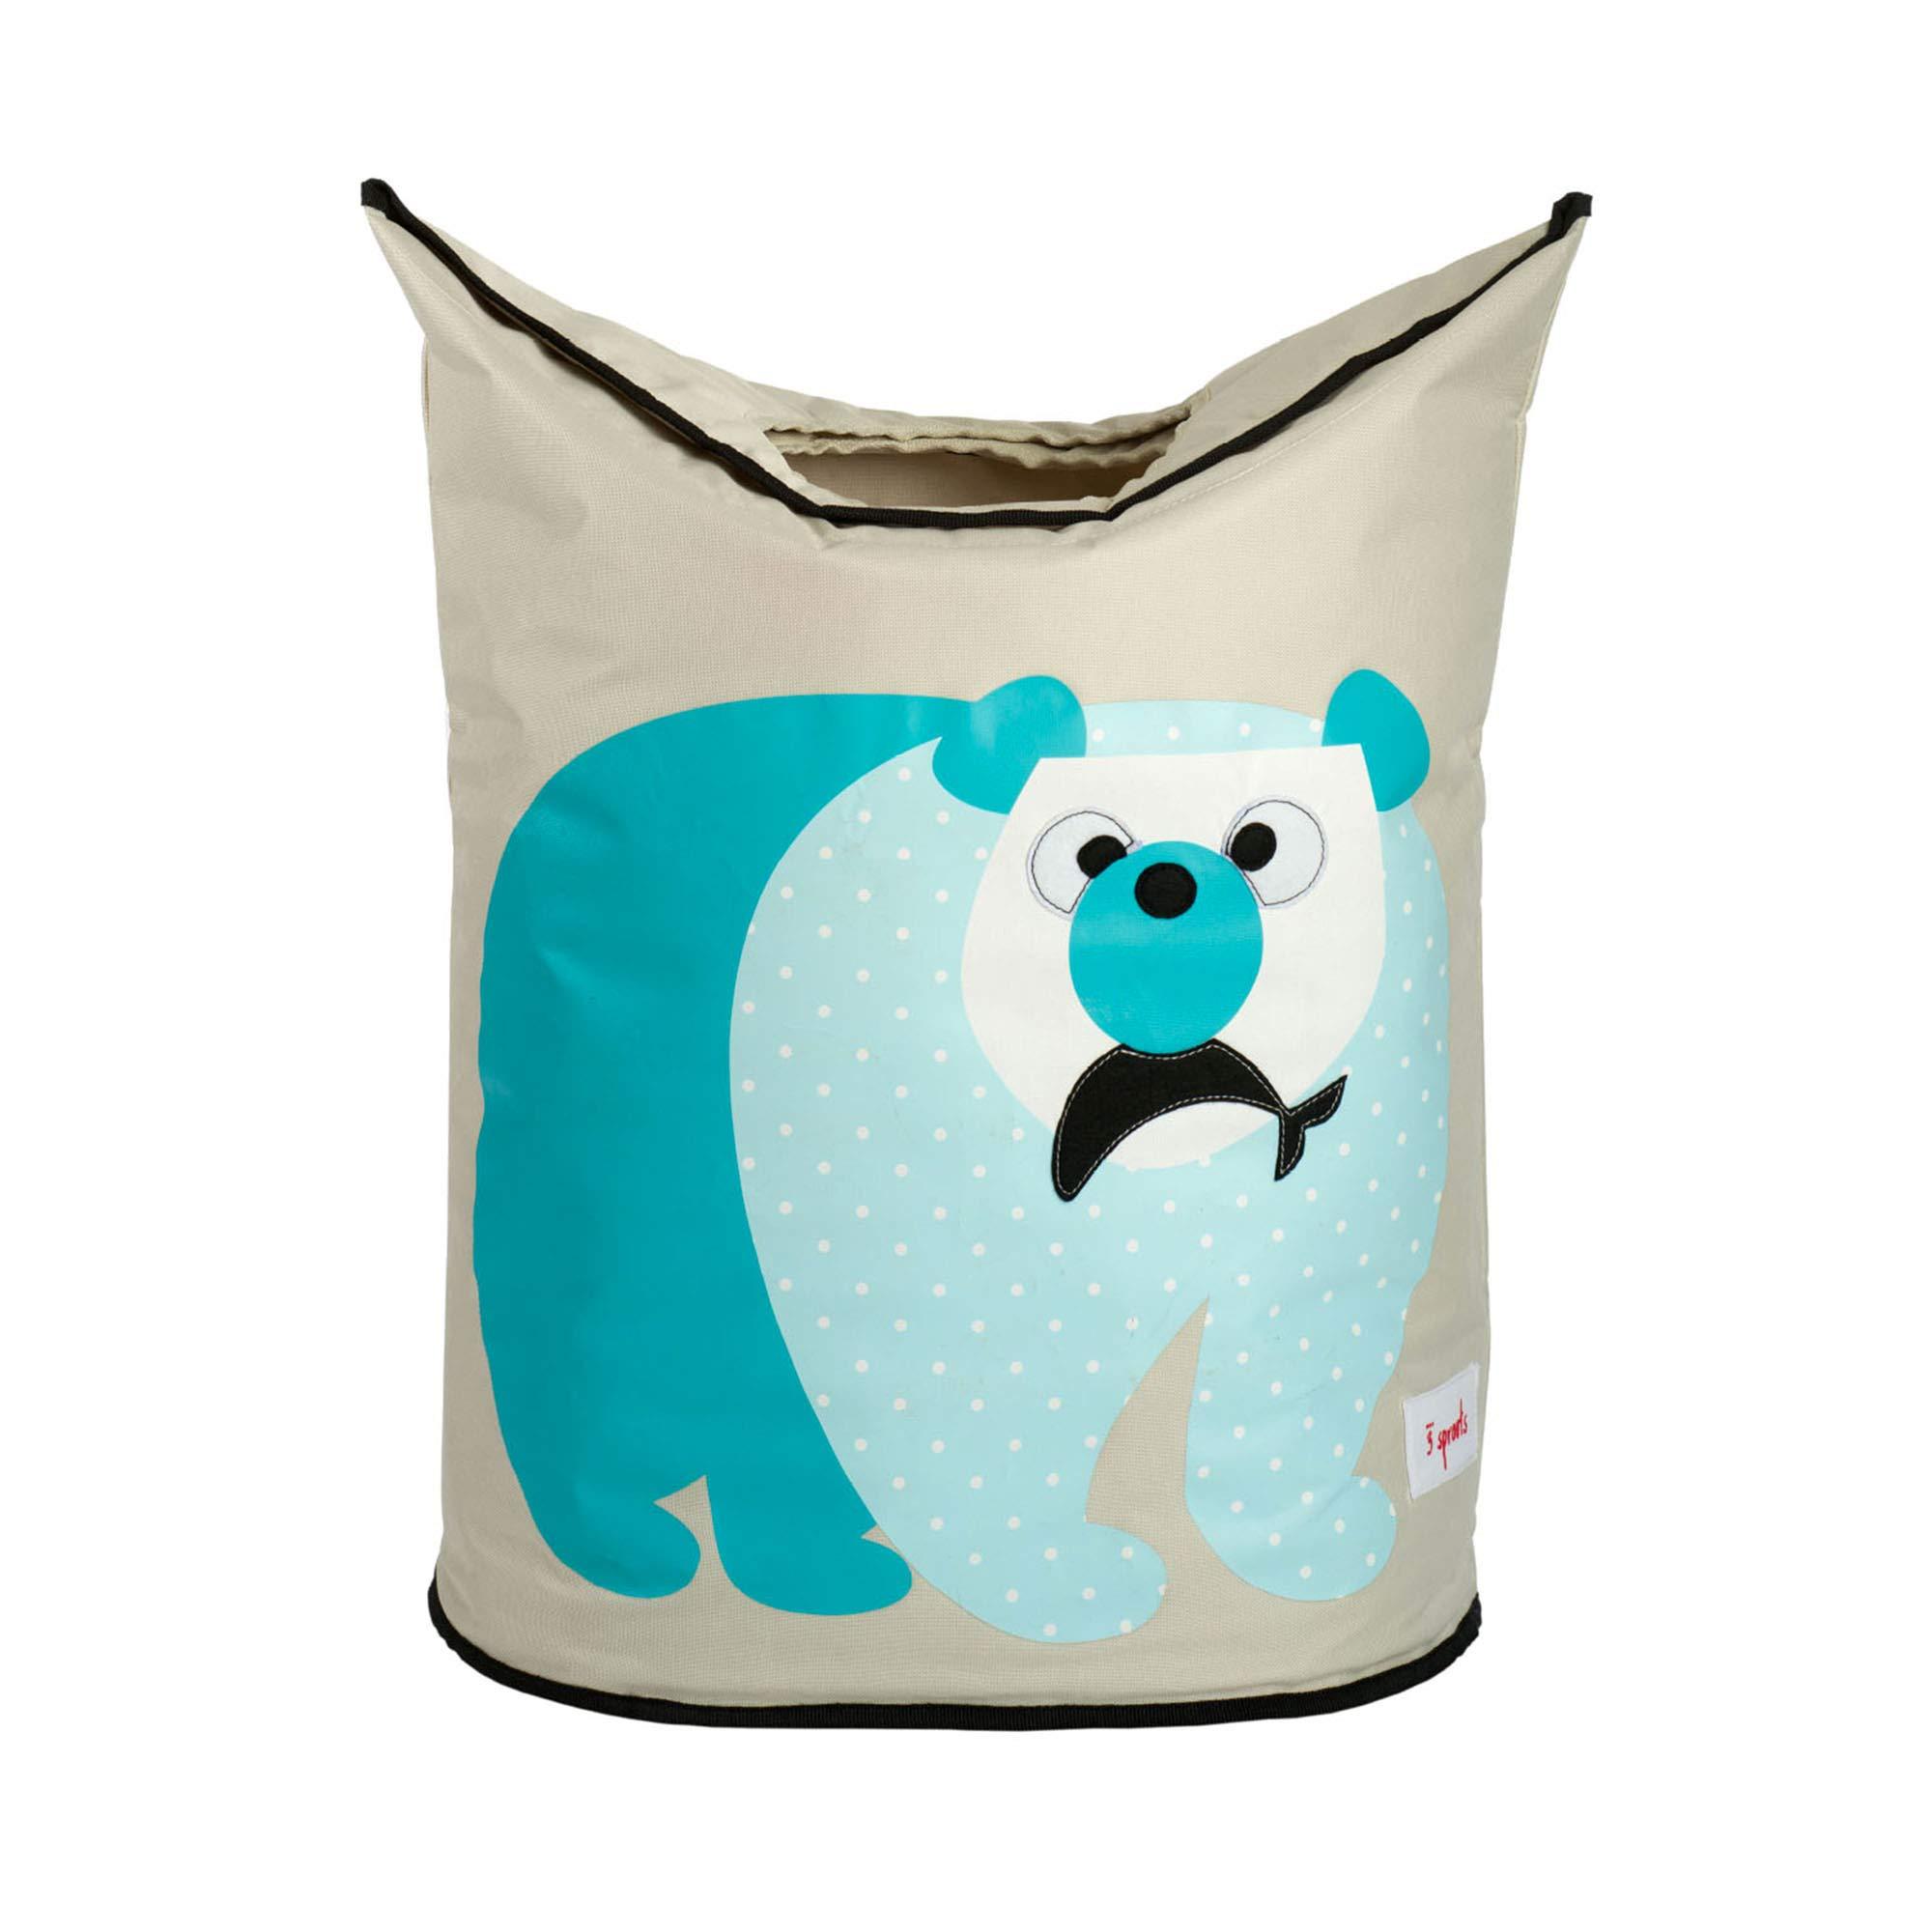 3 Sprouts Baby Laundry Hamper Storage Basket Organizer Bin for Nursery Clothes, Polar Bear